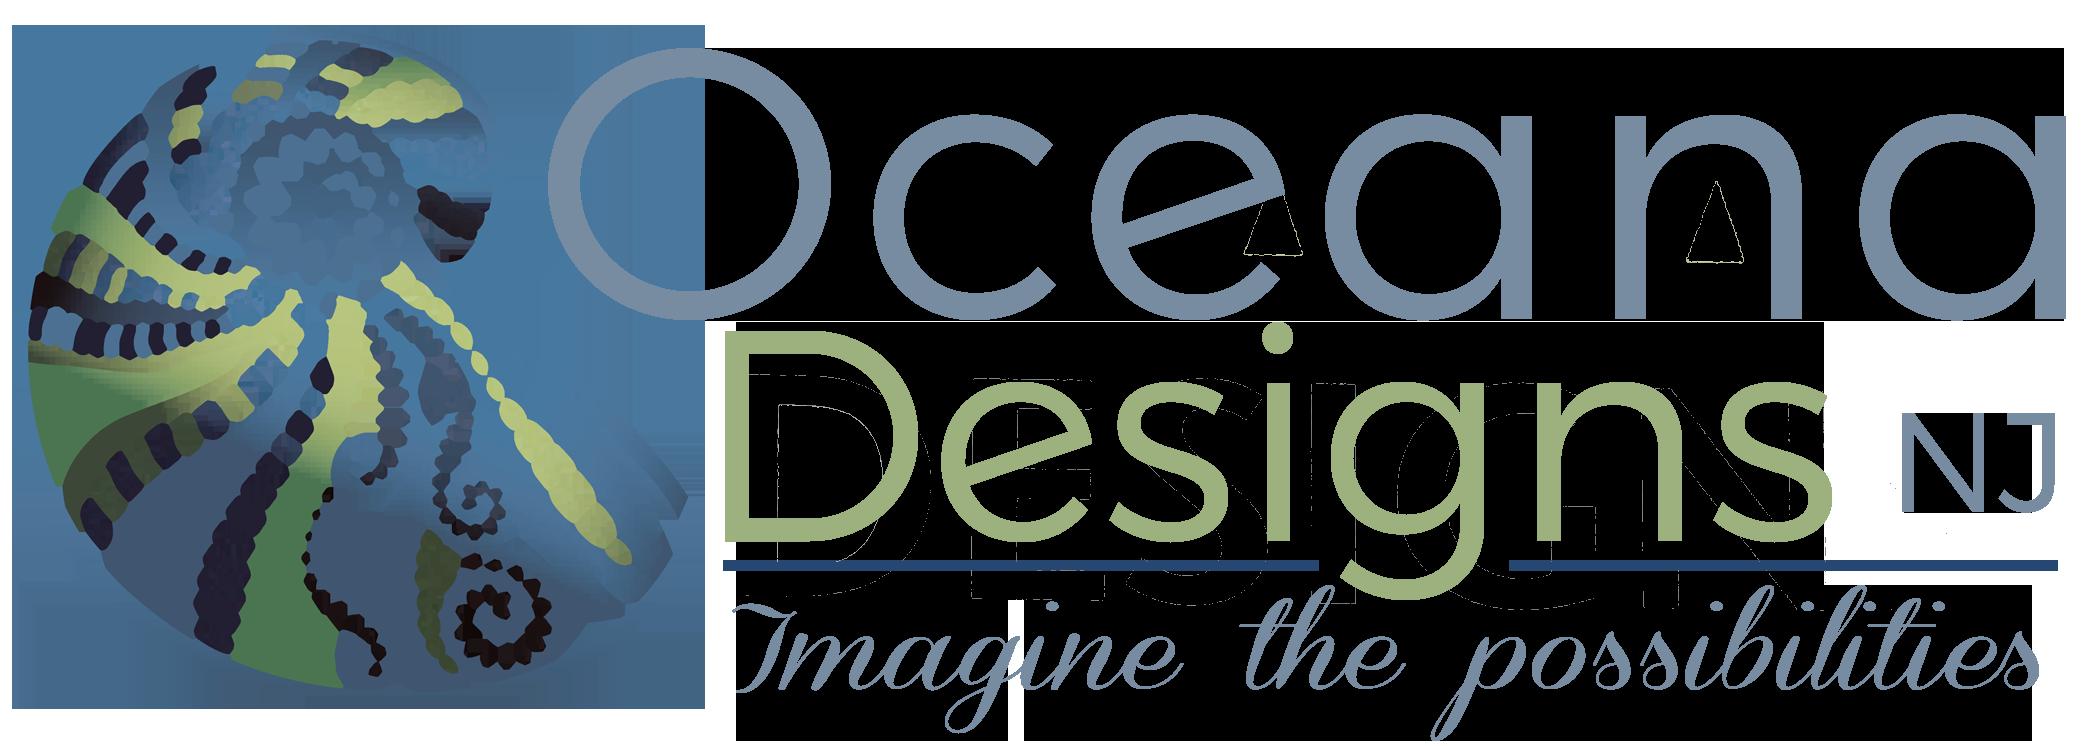 Oceana Designs – New Jersey